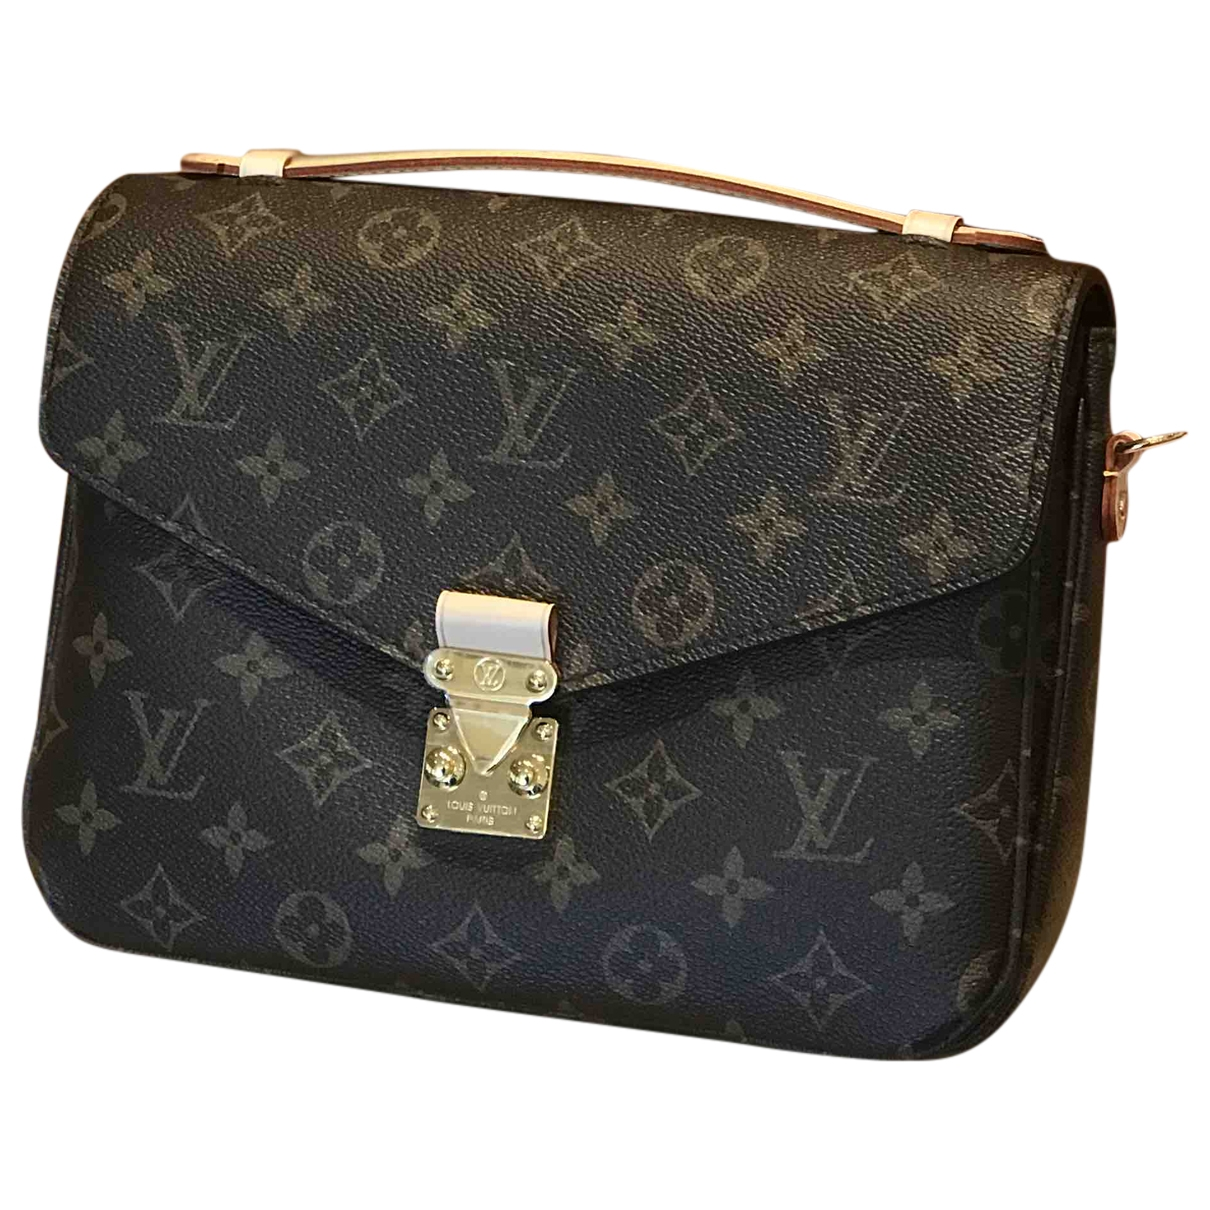 Bandolera Metis de Lona Louis Vuitton